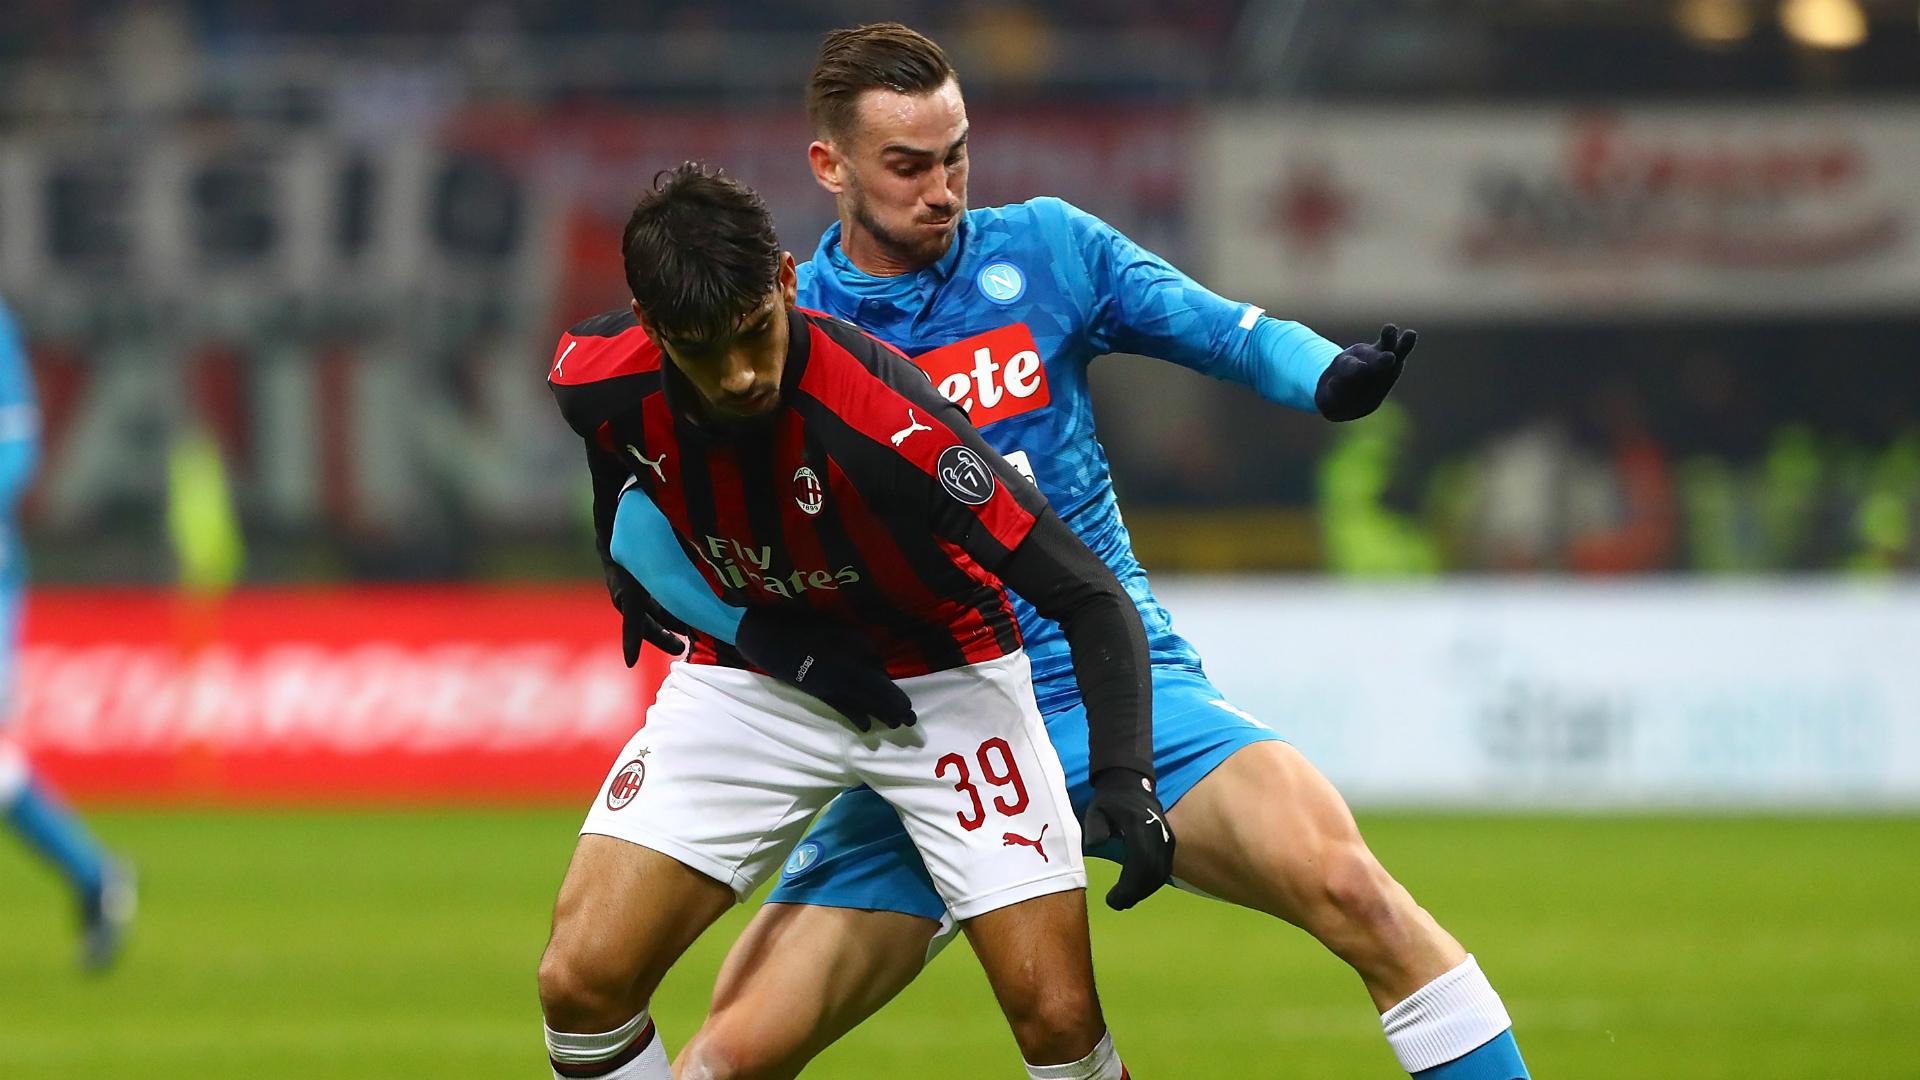 AC Milan's 2-goal Piatek: I expected this to happen